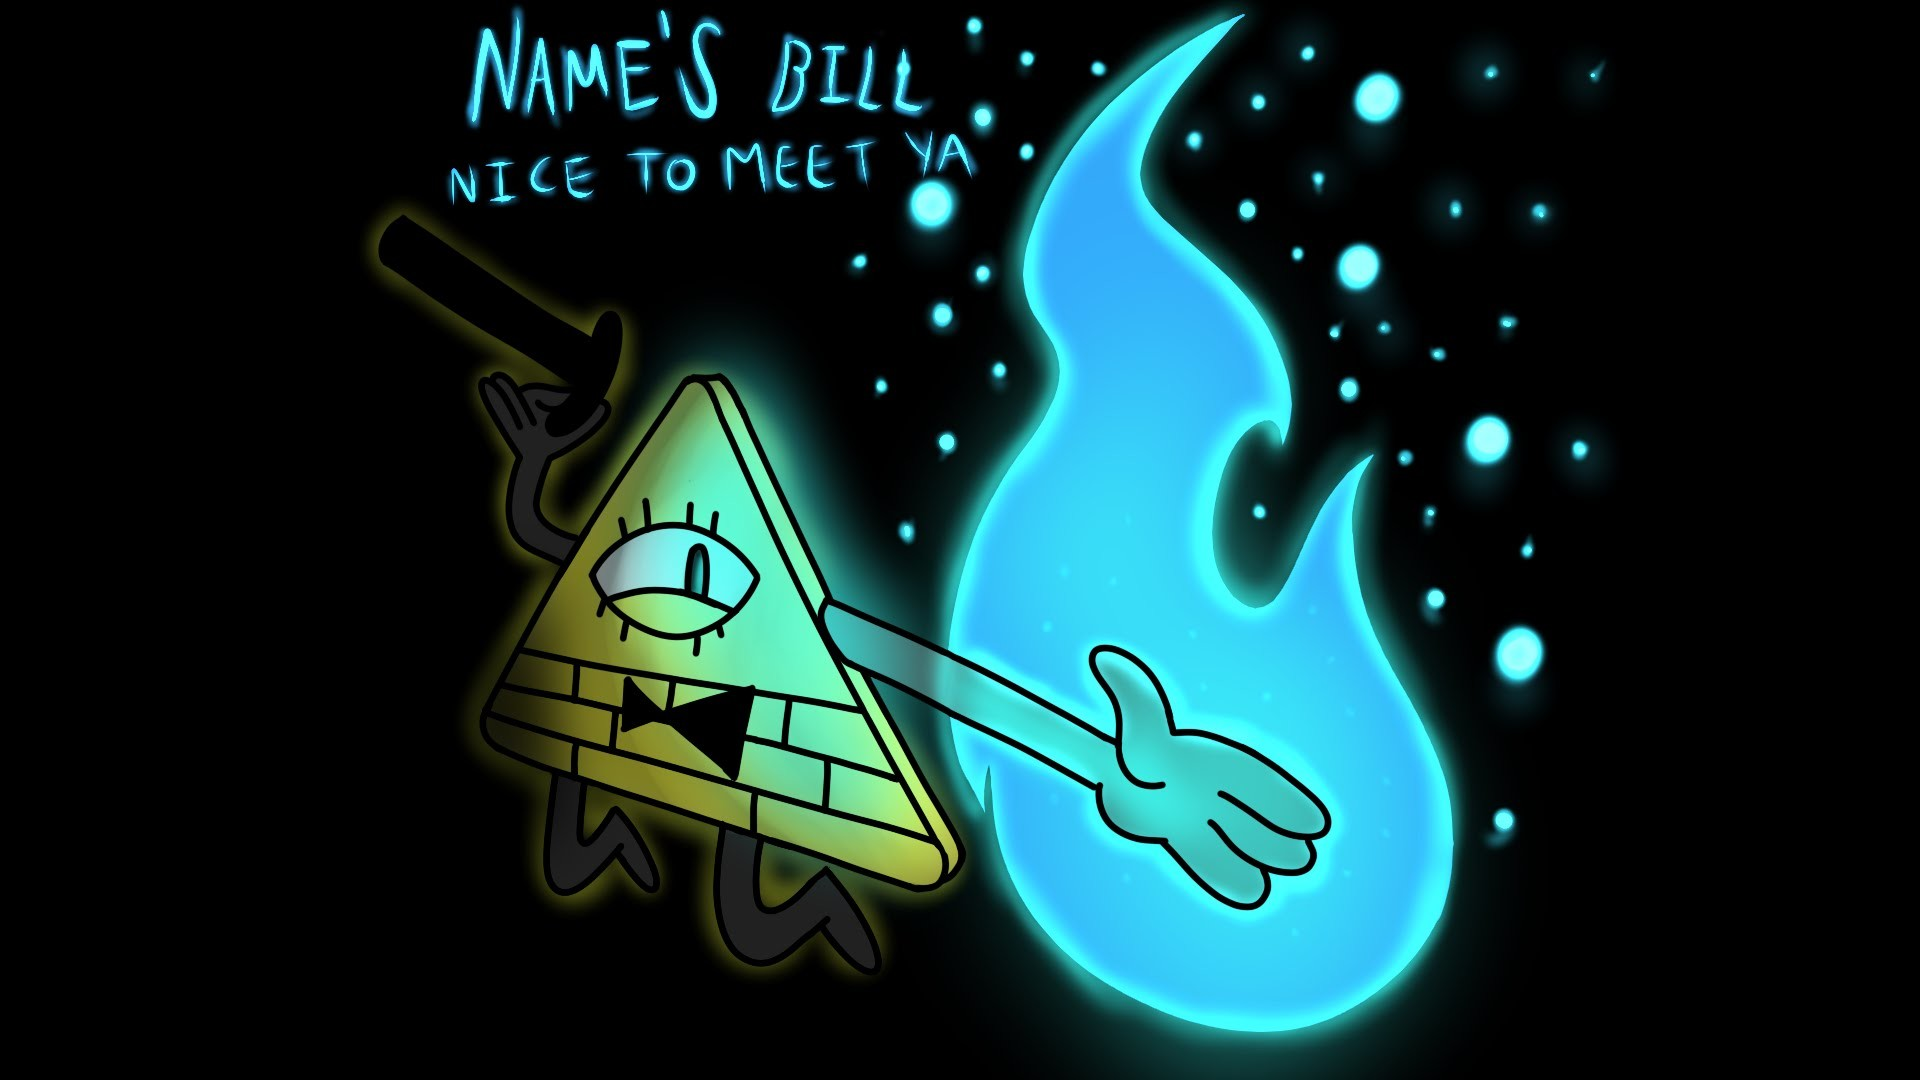 In memory of Bill Cipher